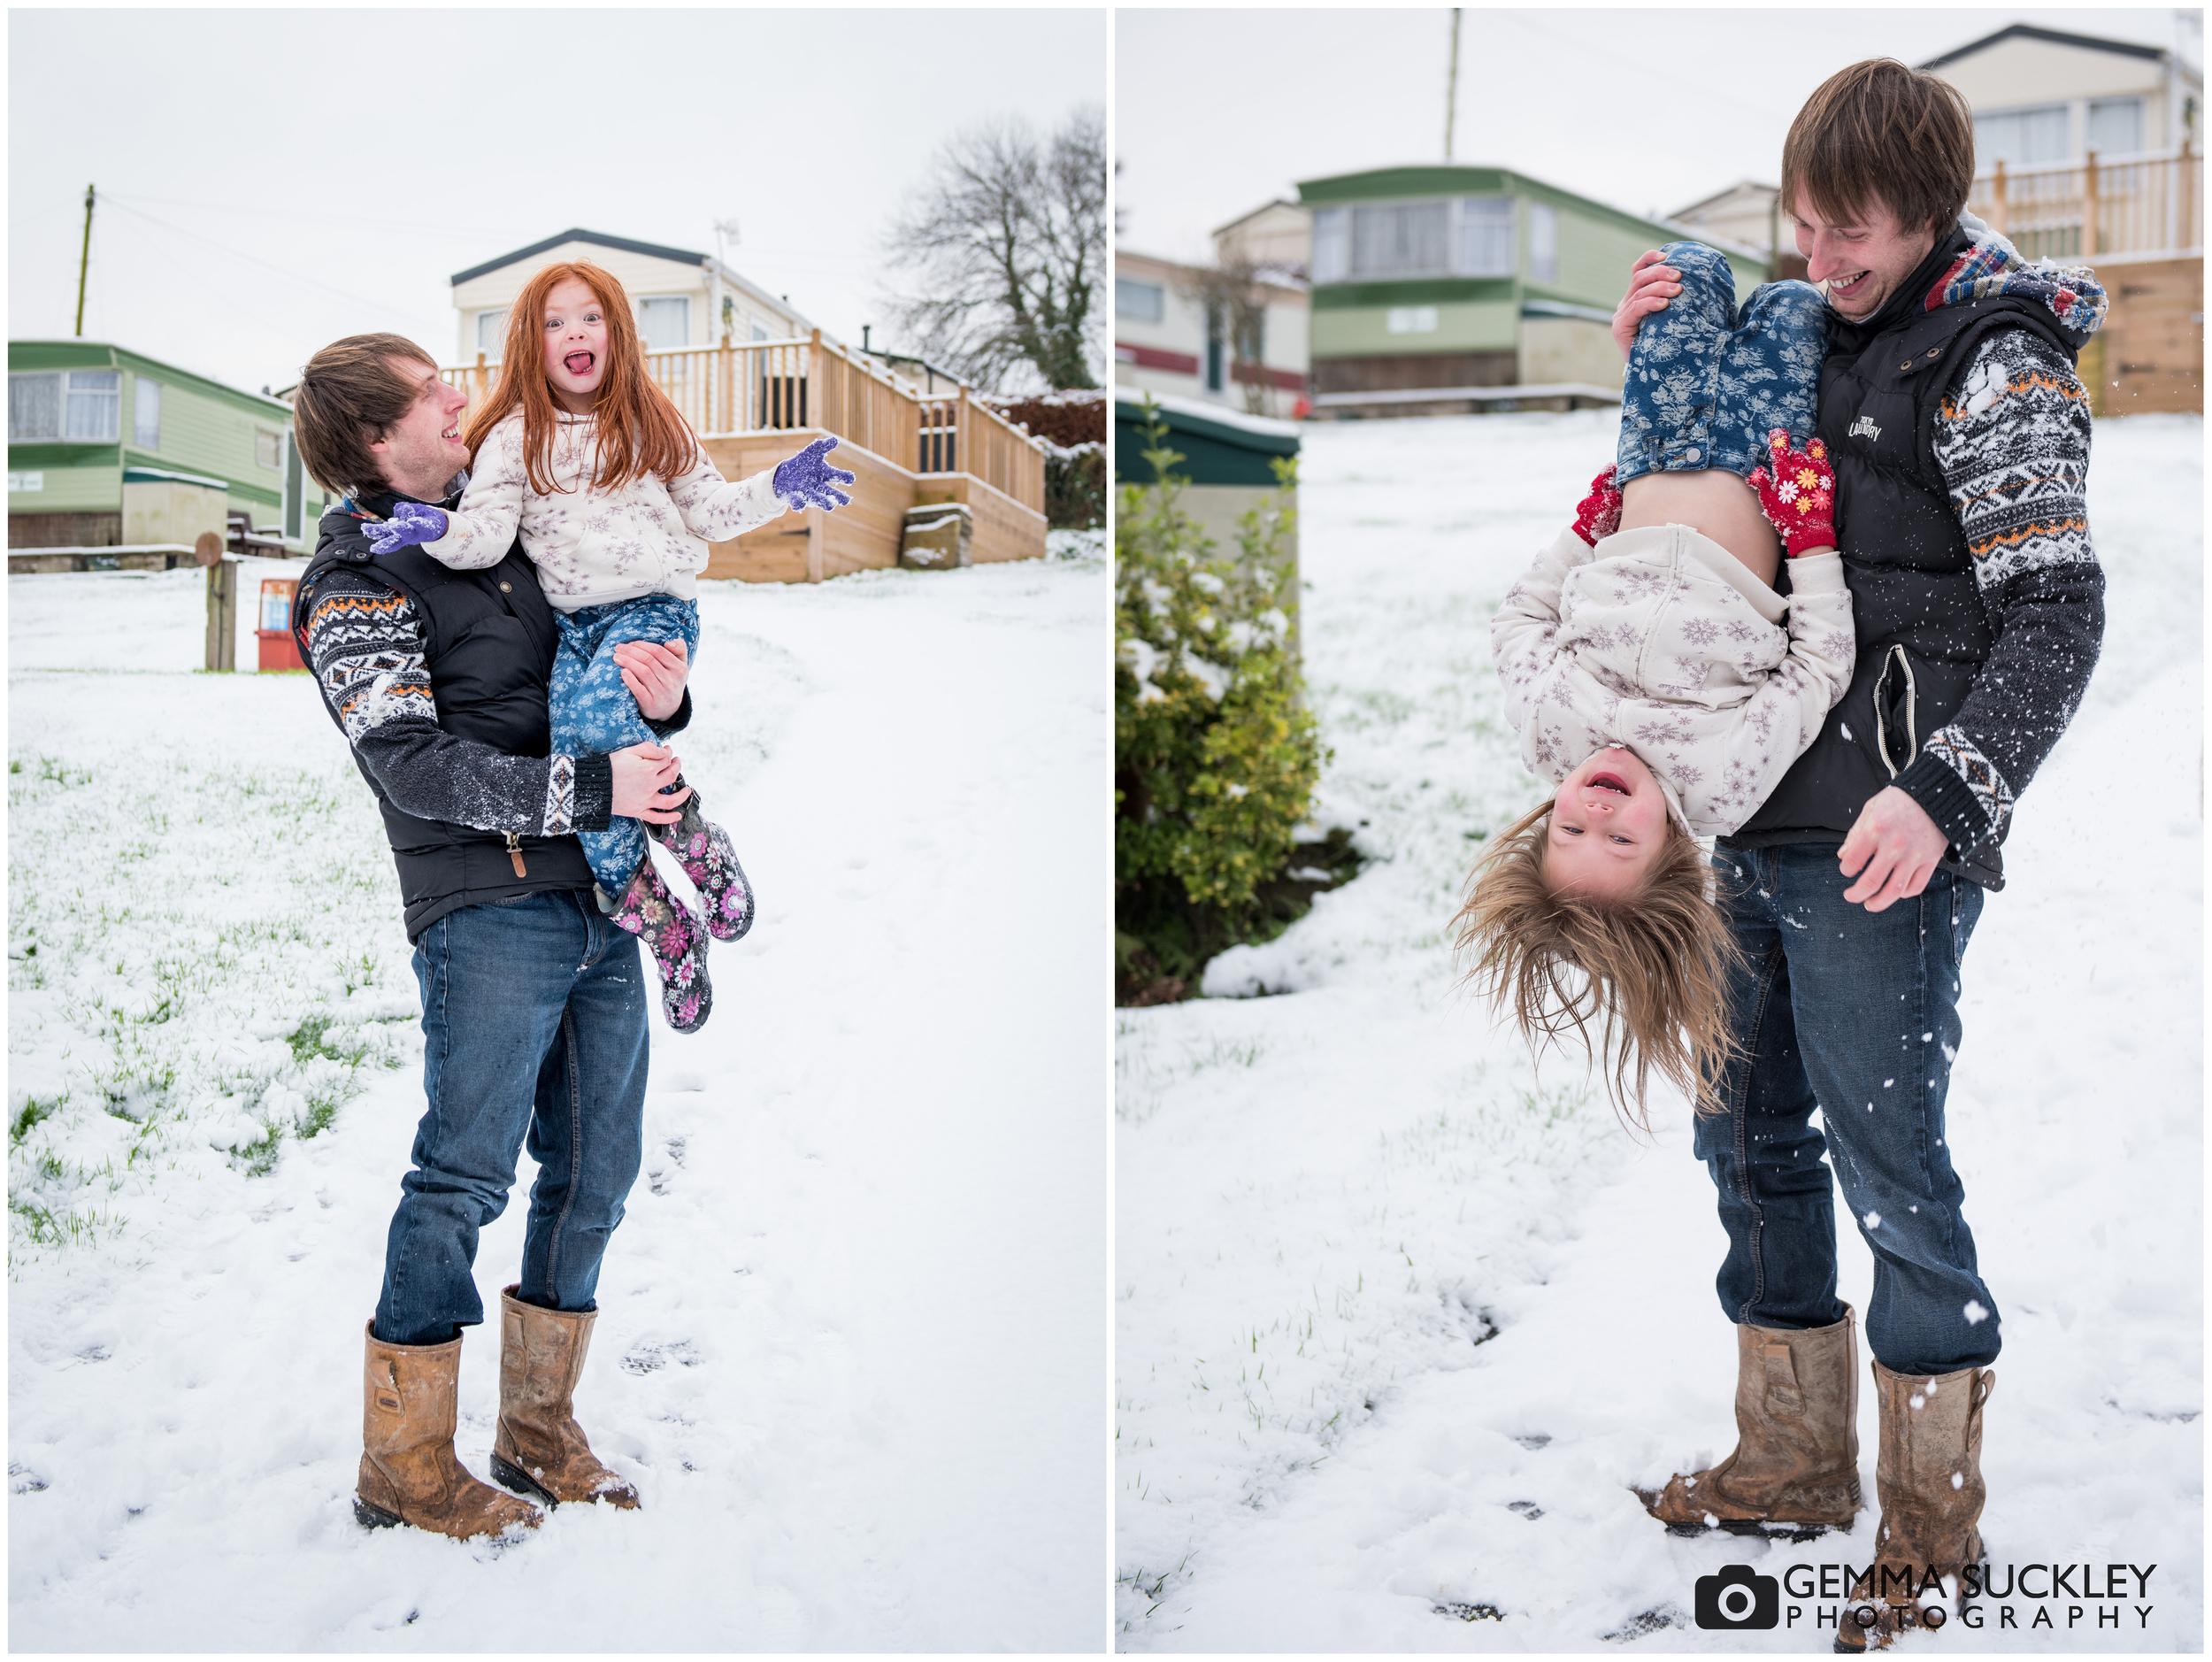 addingham-family-photo-sessions.jpg